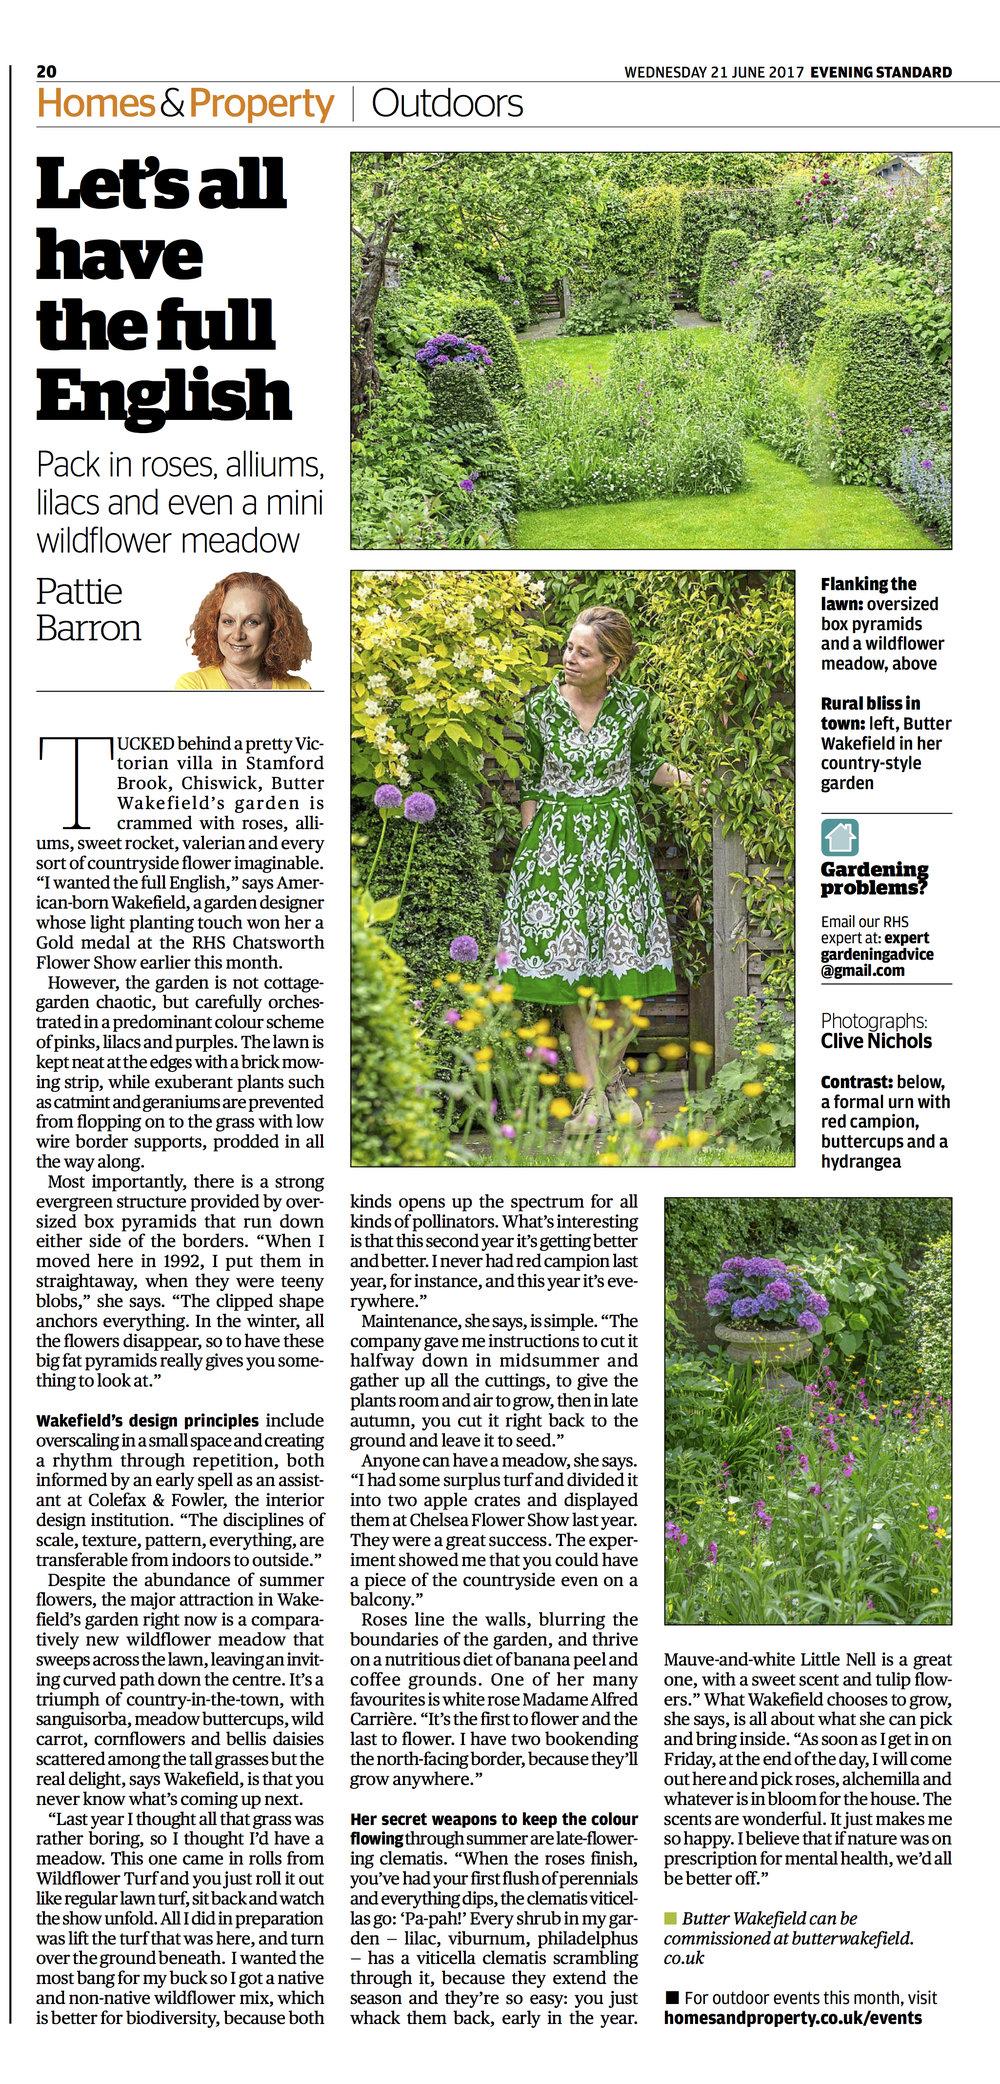 My garden's been featured in the Evening Standard magazine!